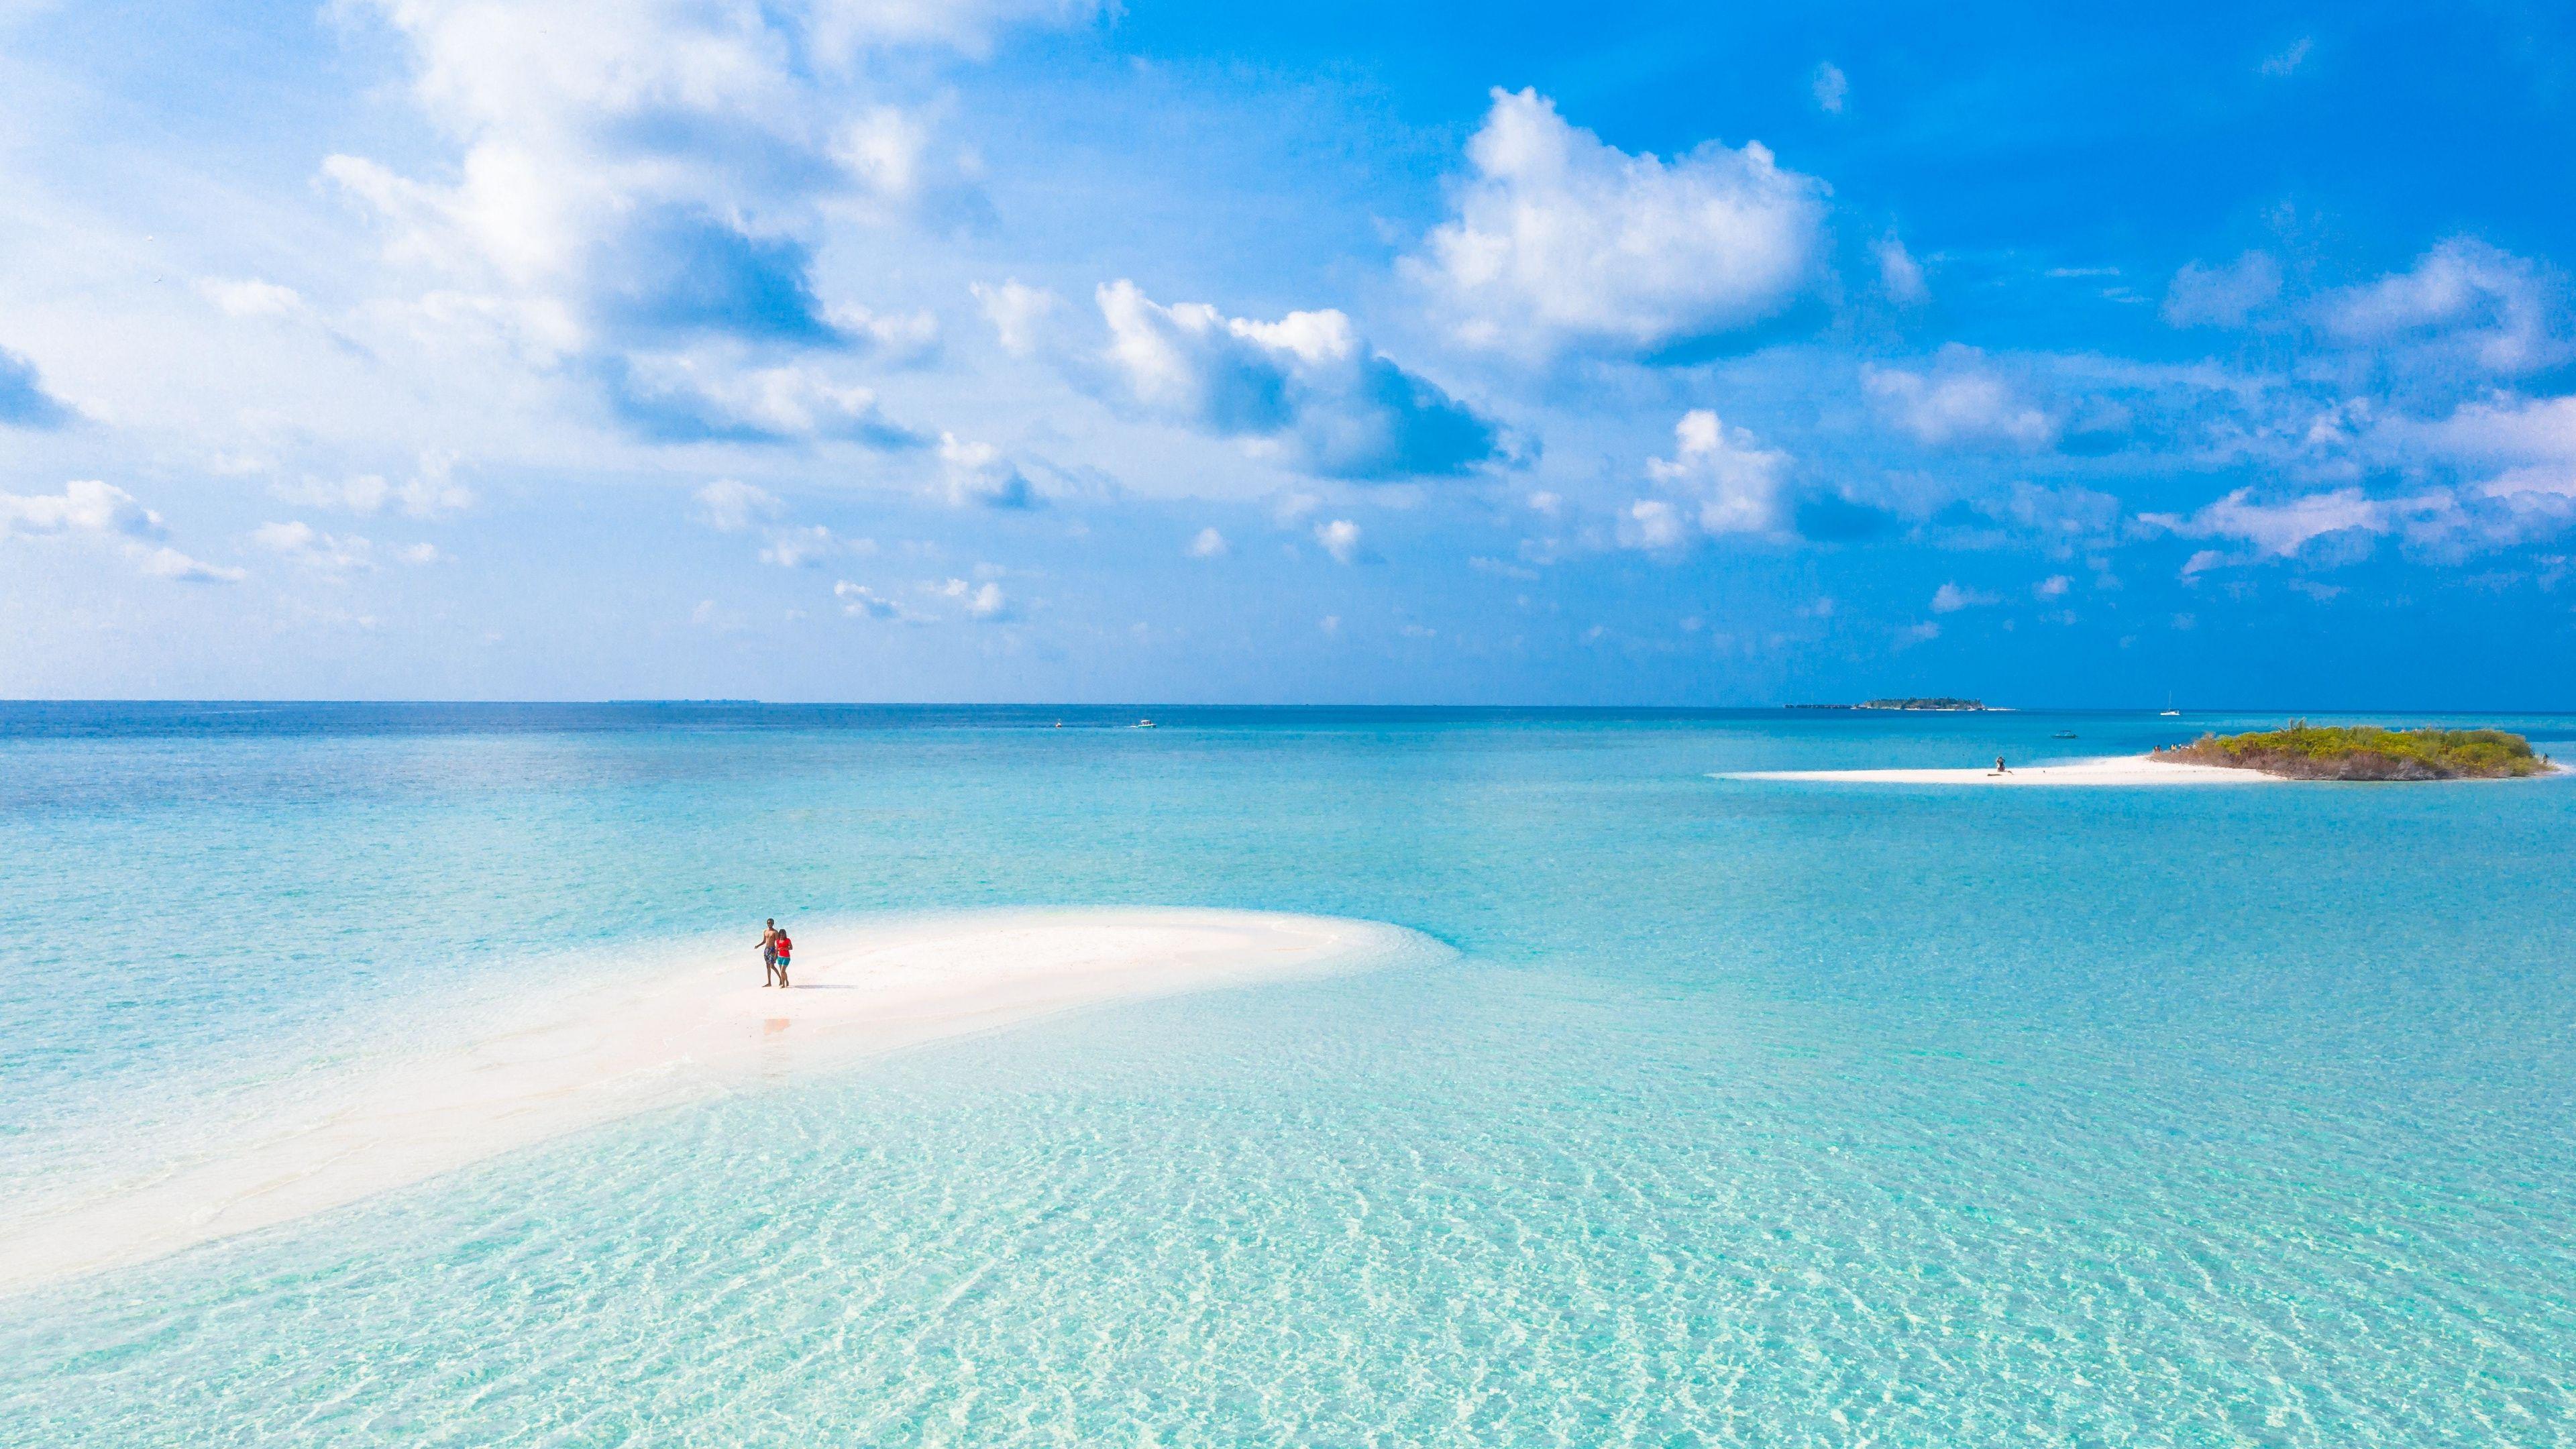 3840x2160 Tropical Beach Sea Sunny Day Wallpaper In 2020 Birds Eye Birds Eye View View Wallpaper